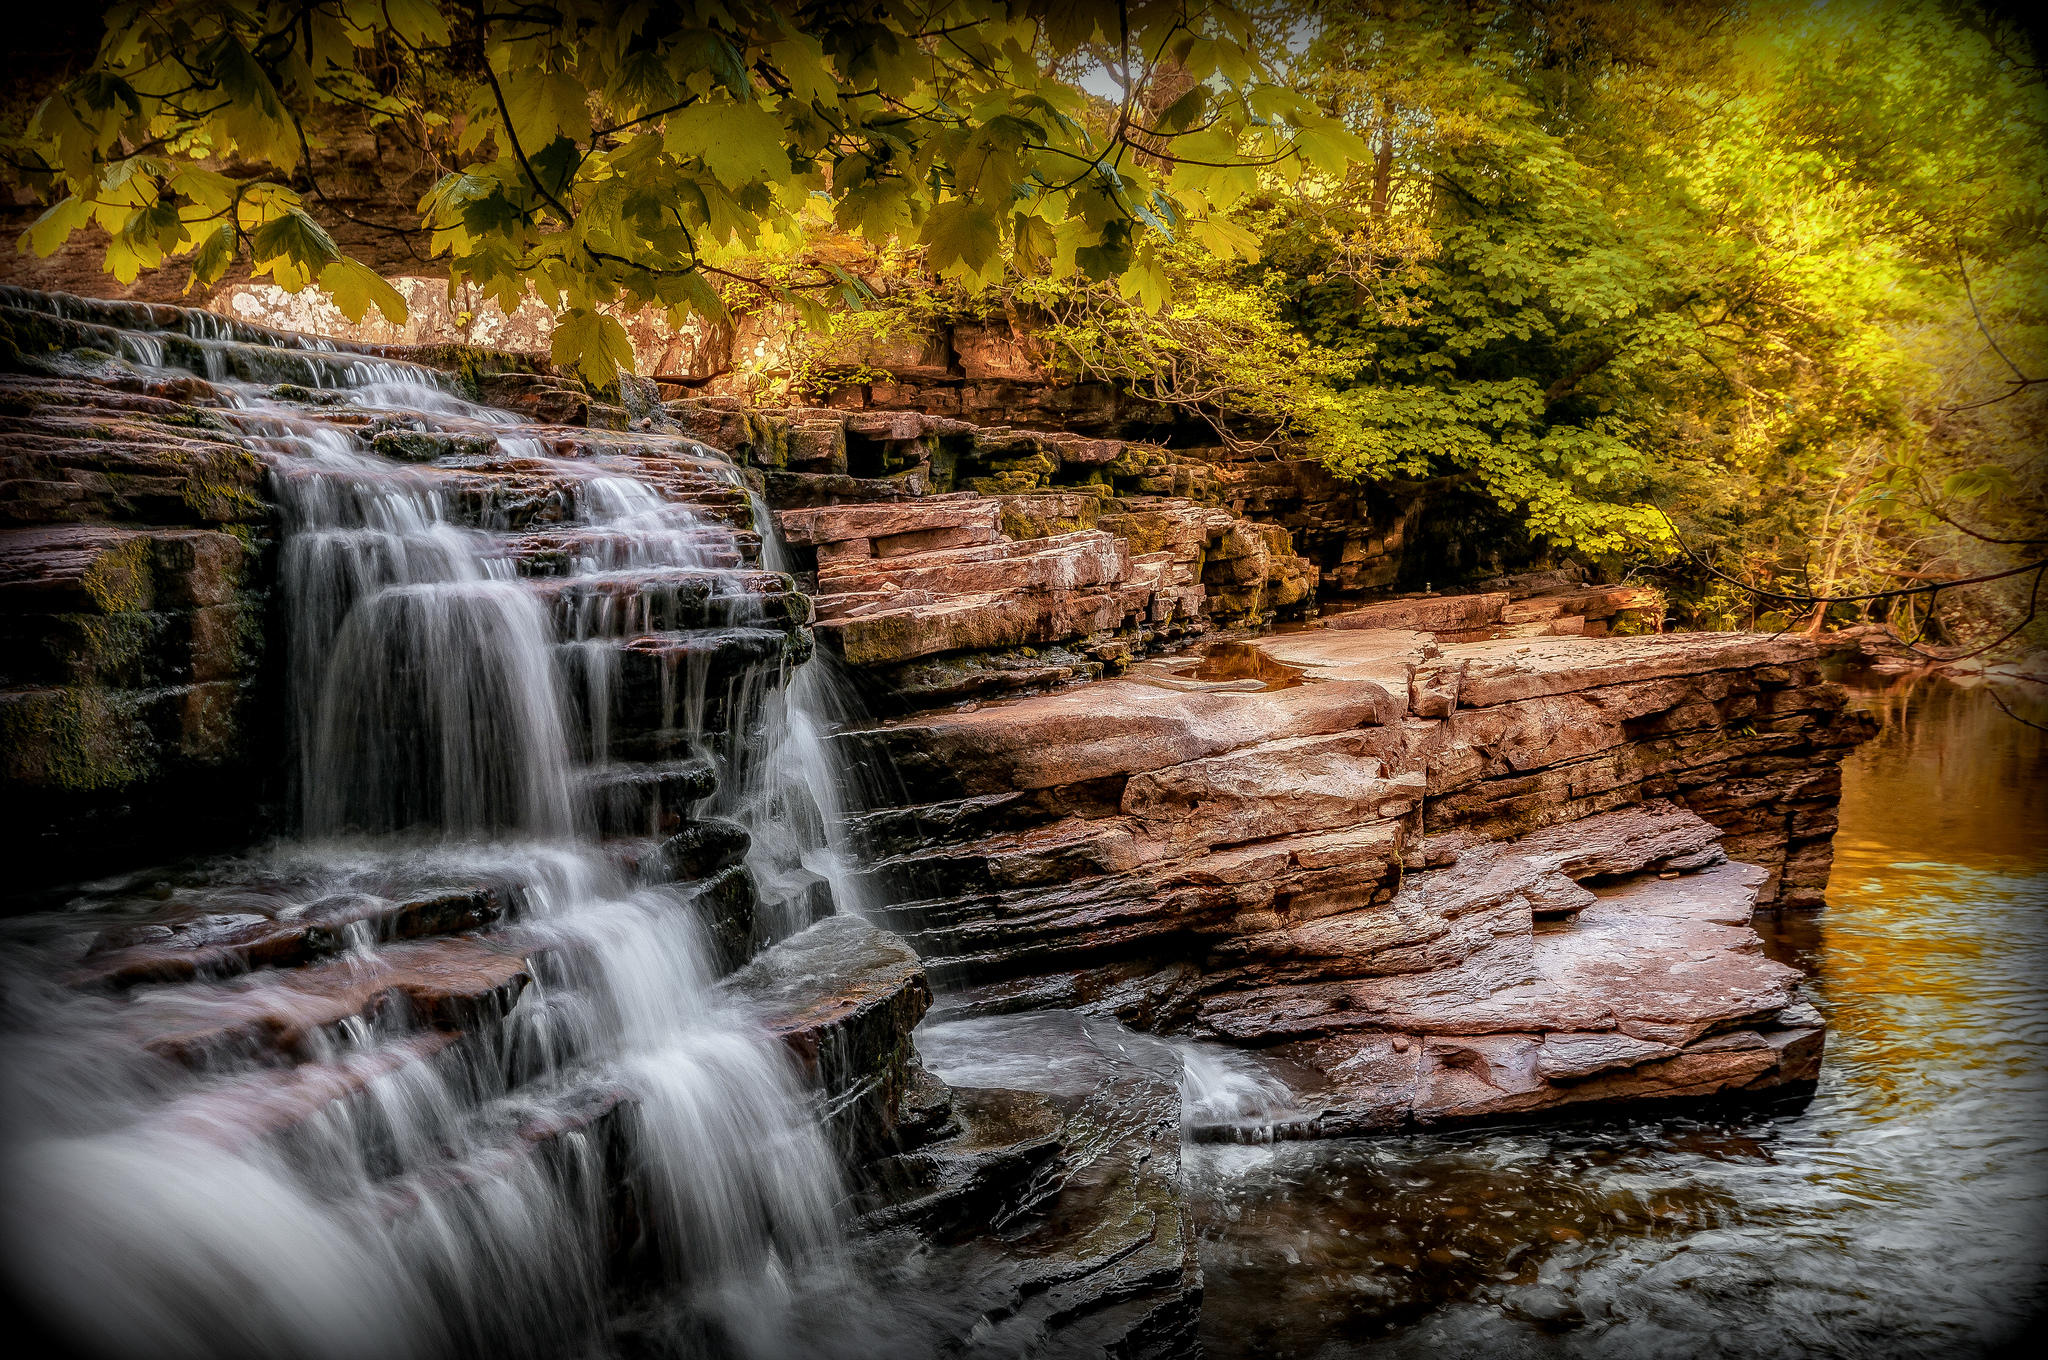 обои водопад, скалы, деревья, Йоркшир картинки фото